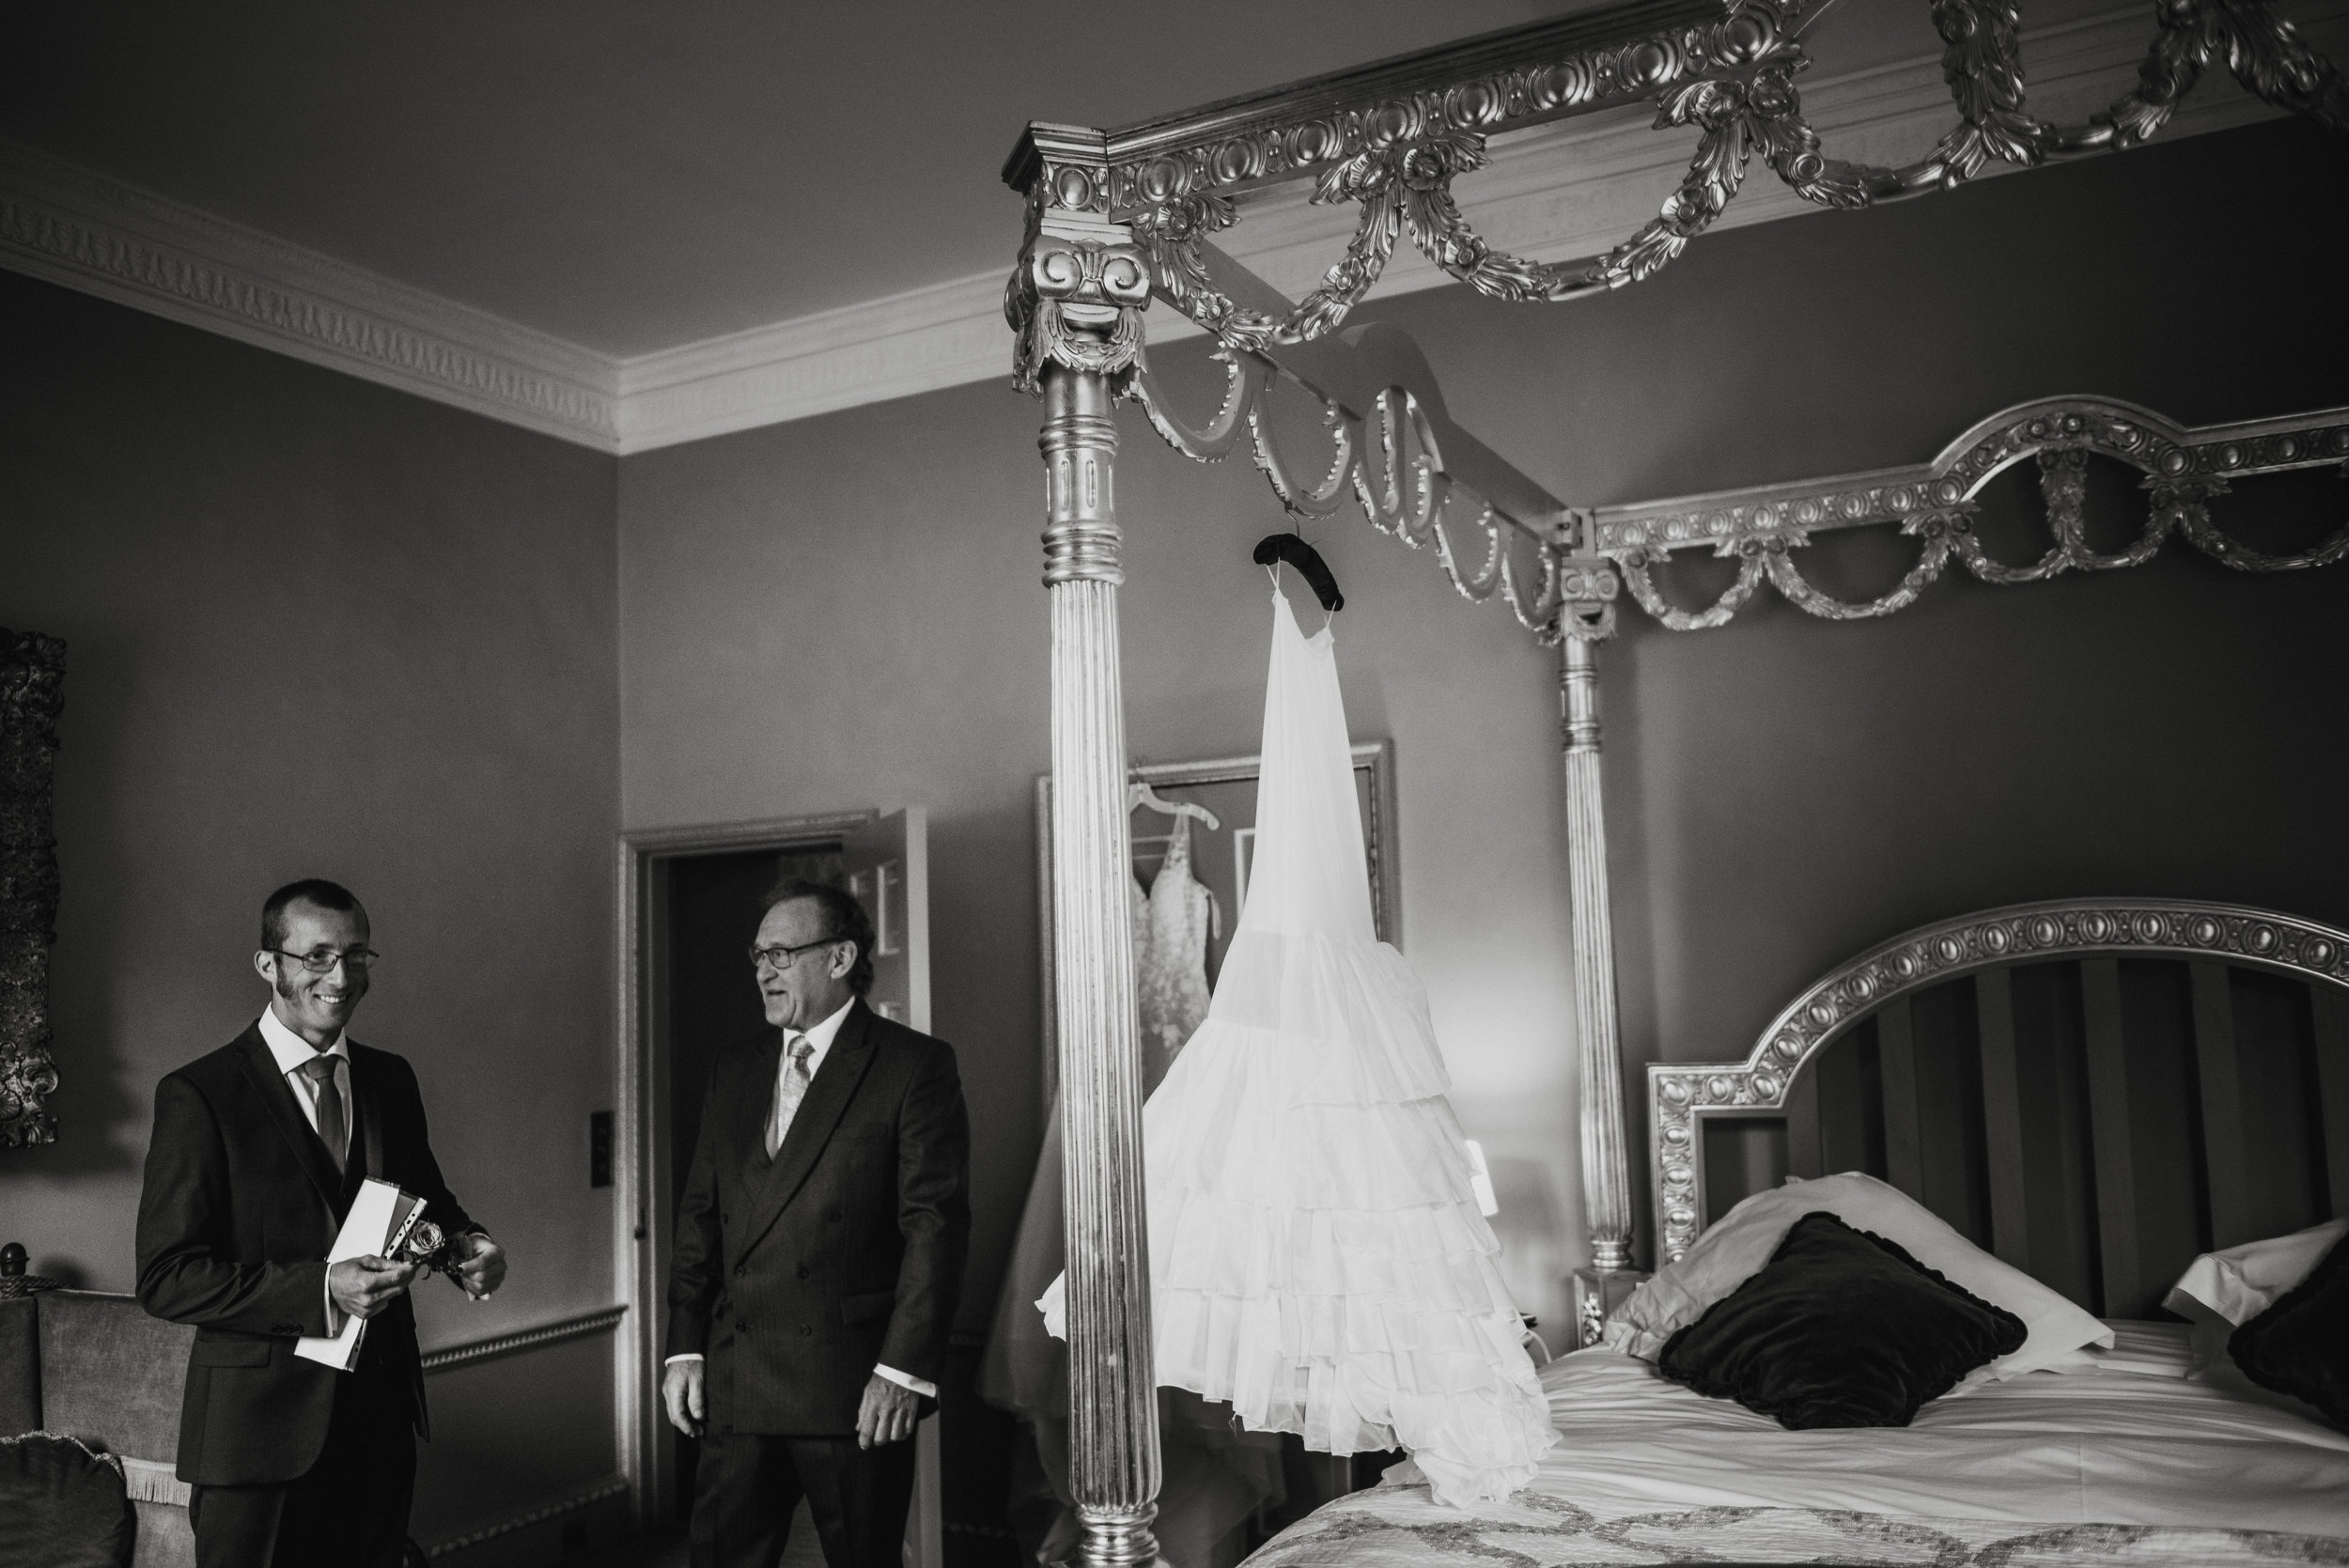 port-eliot-wedding-photographer-18.jpg